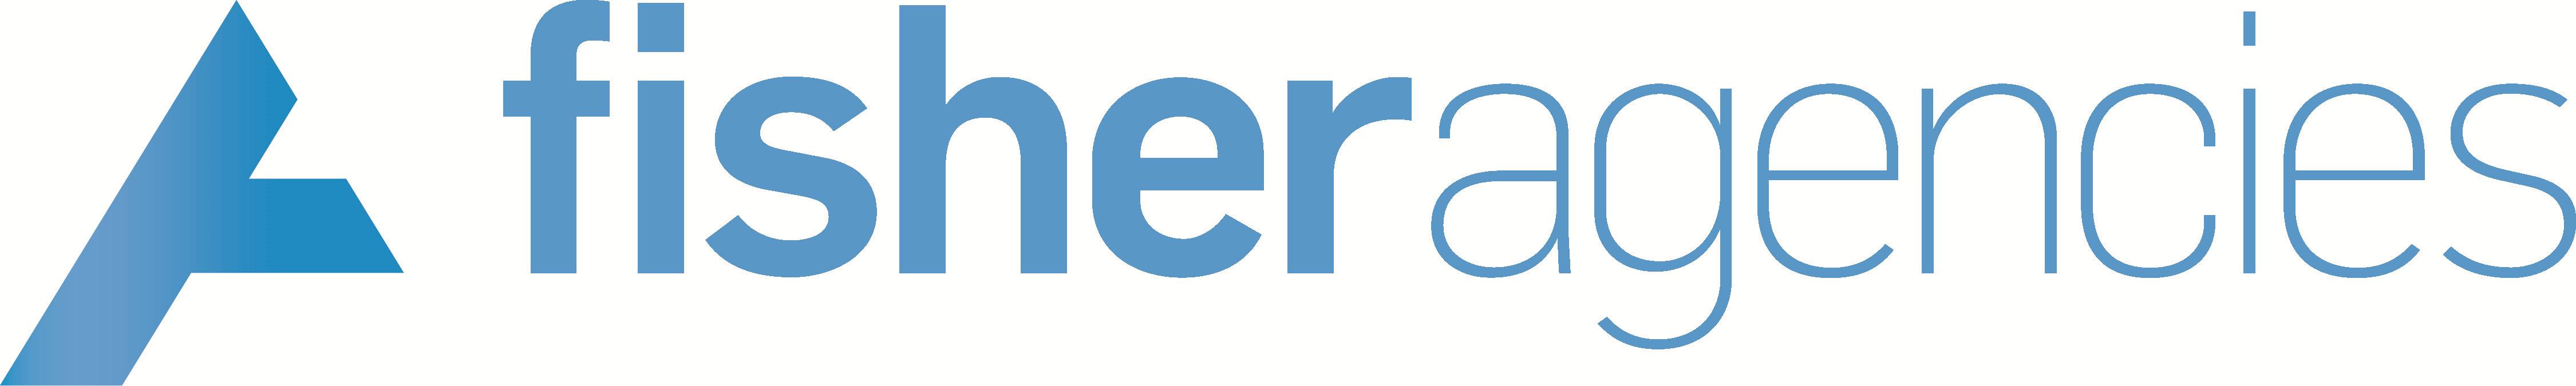 Fisher Agencies logo